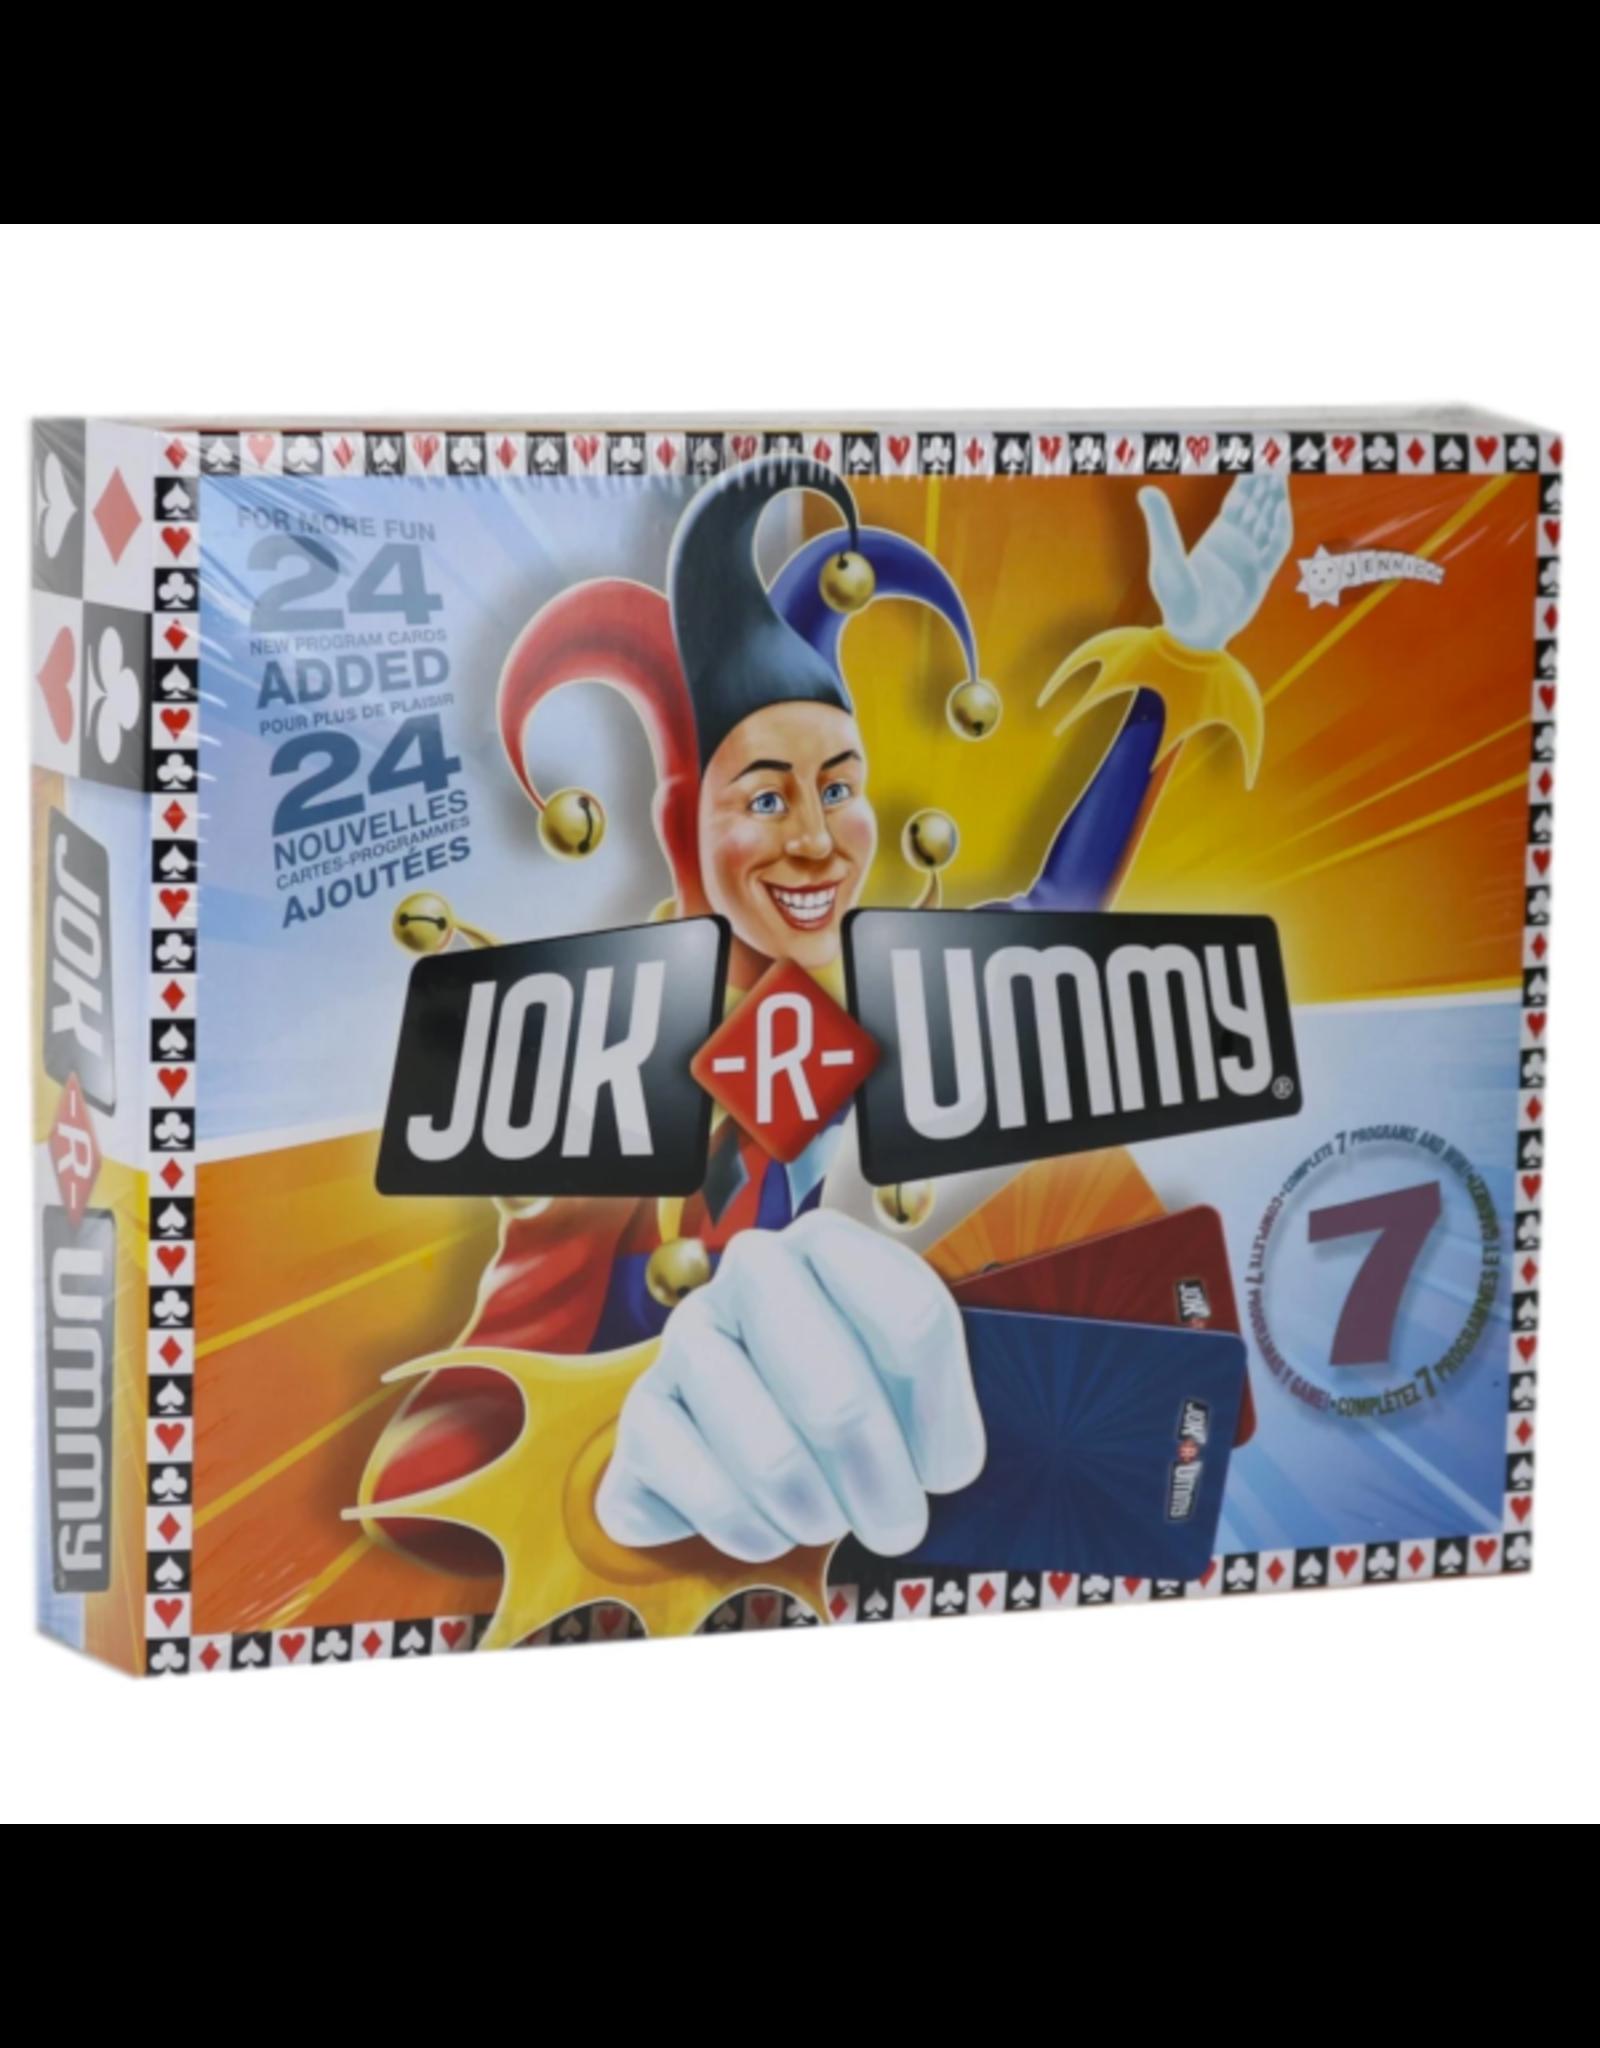 Jennick Inc Jok-R-ummy [multilingue]